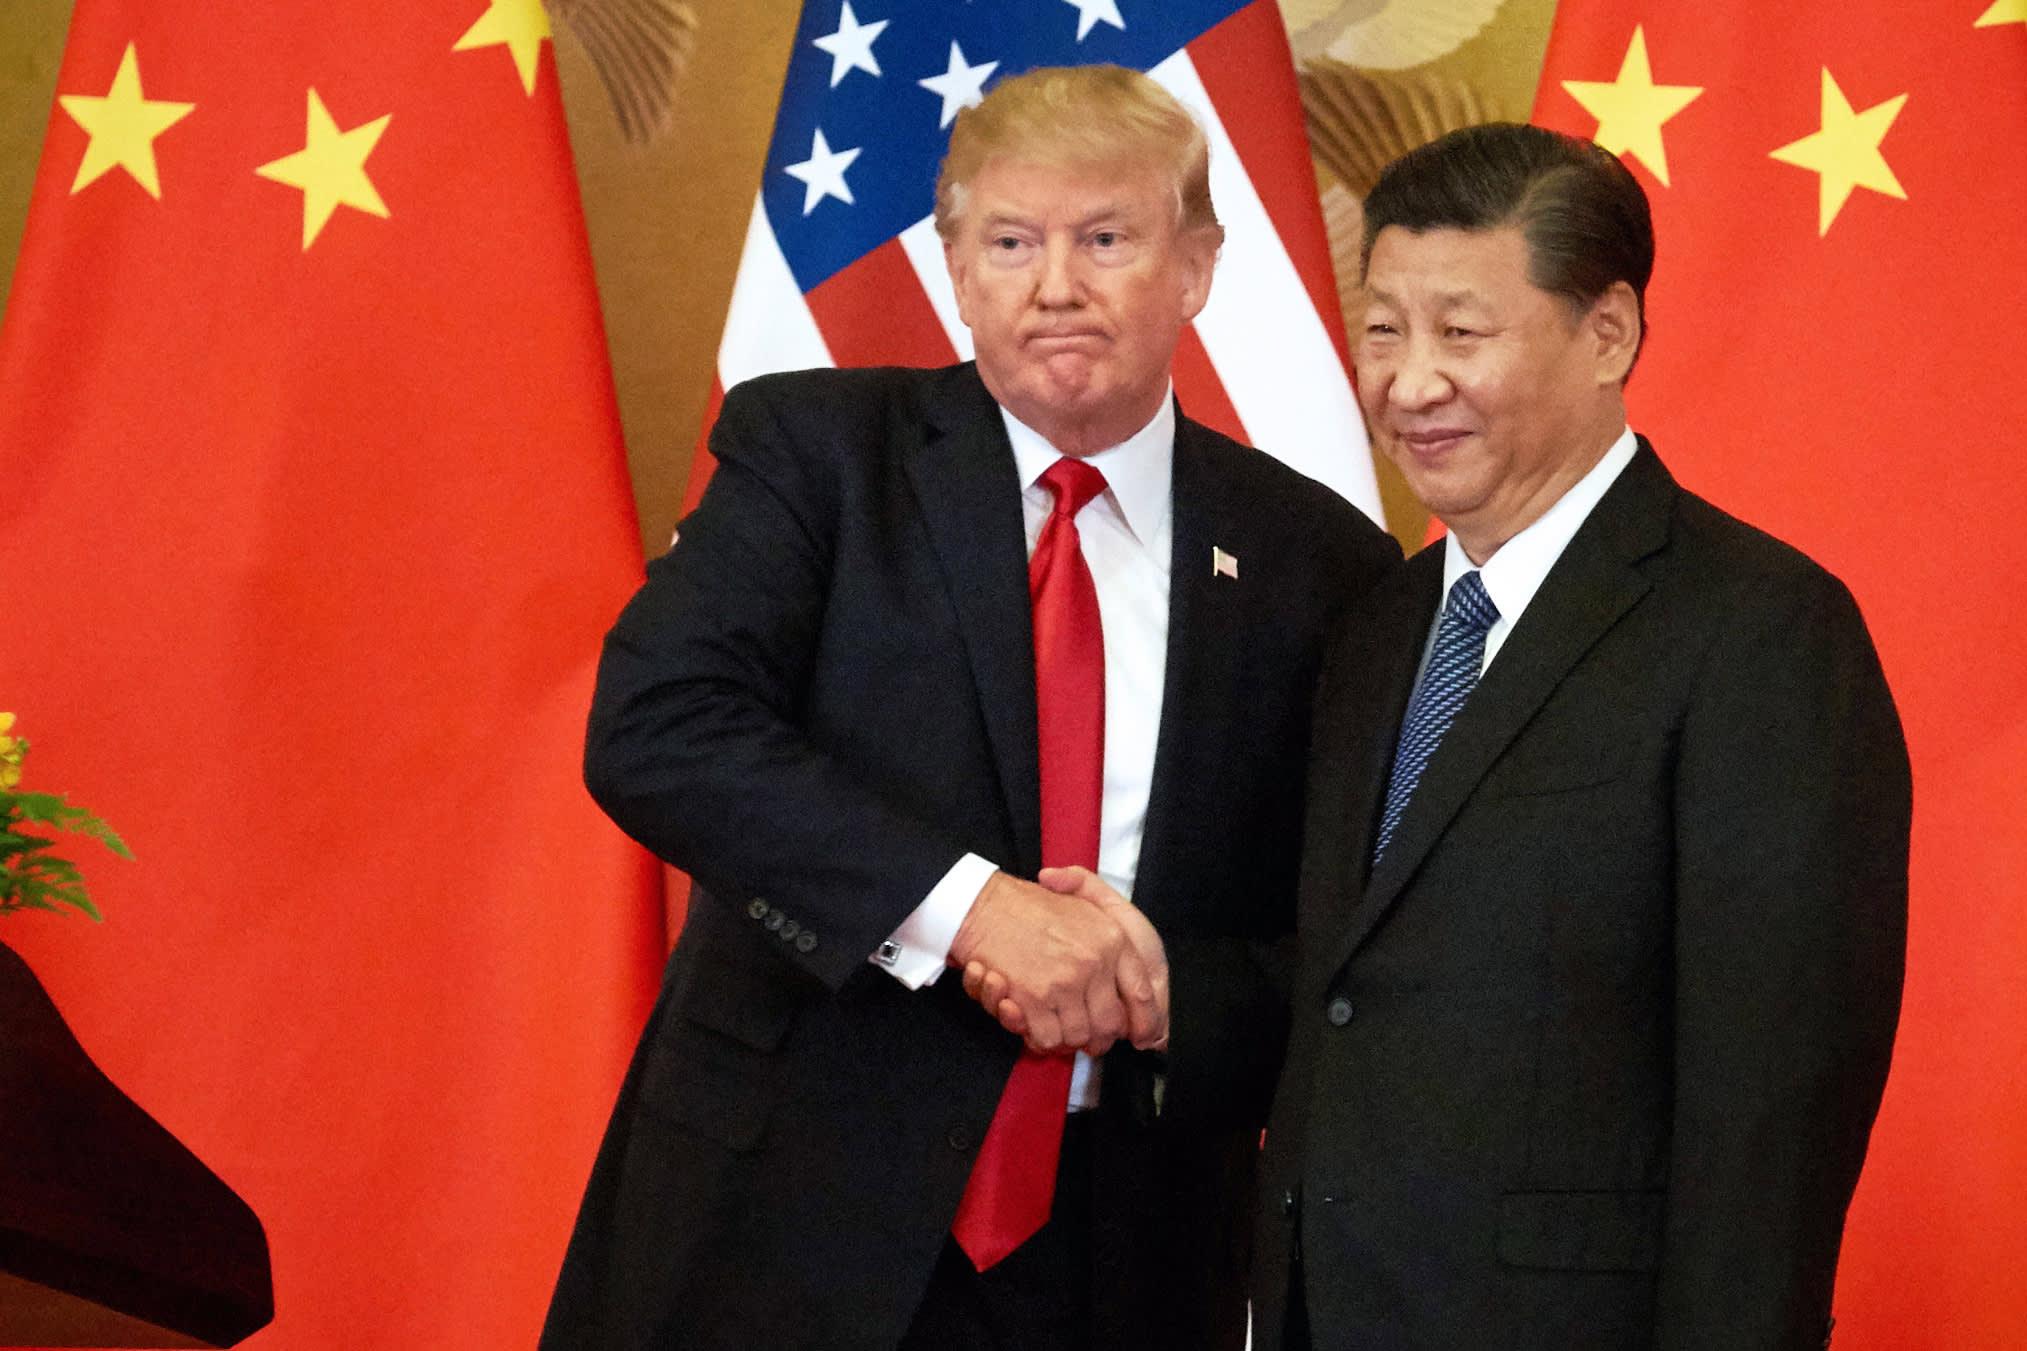 Asia Pacific stocks advance as investors await Trump-Xi meeting